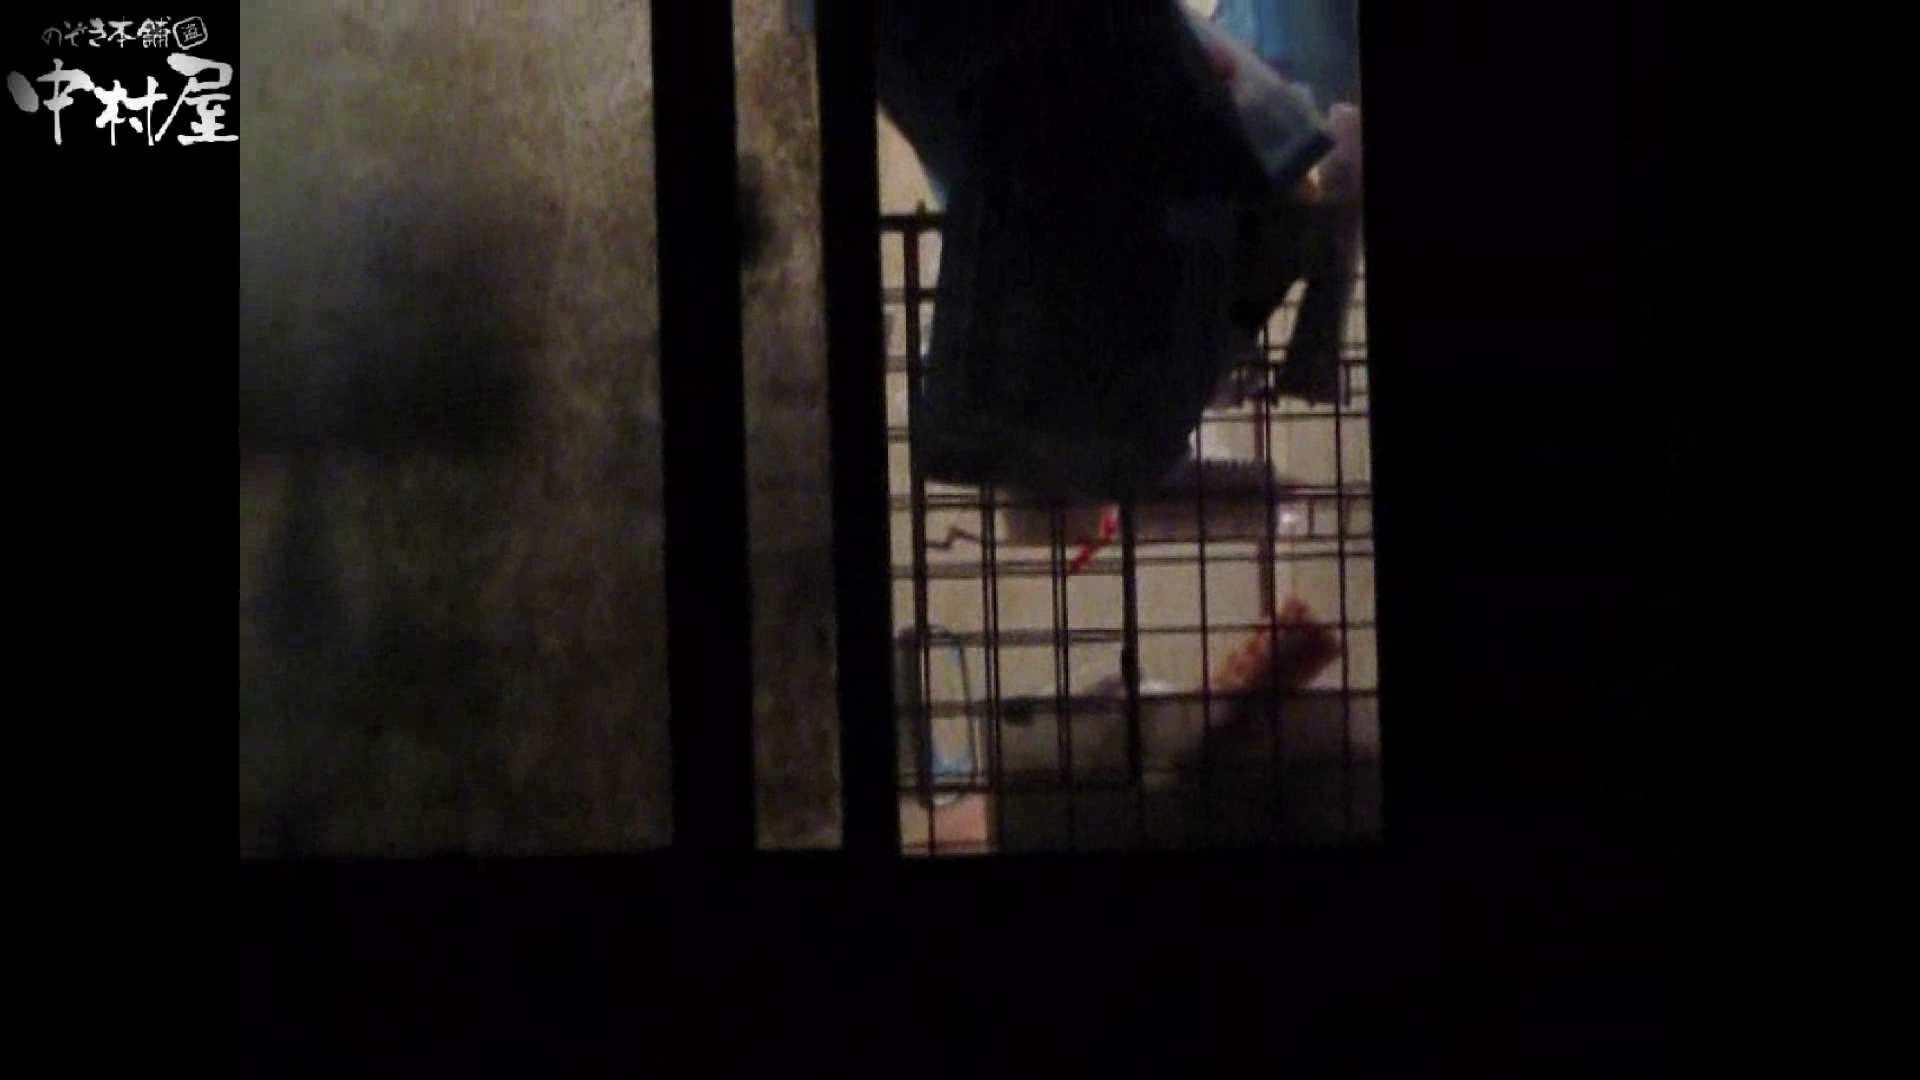 民家風呂専門盗撮師の超危険映像 vol.023 OLのエロ生活 性交動画流出 95連発 50